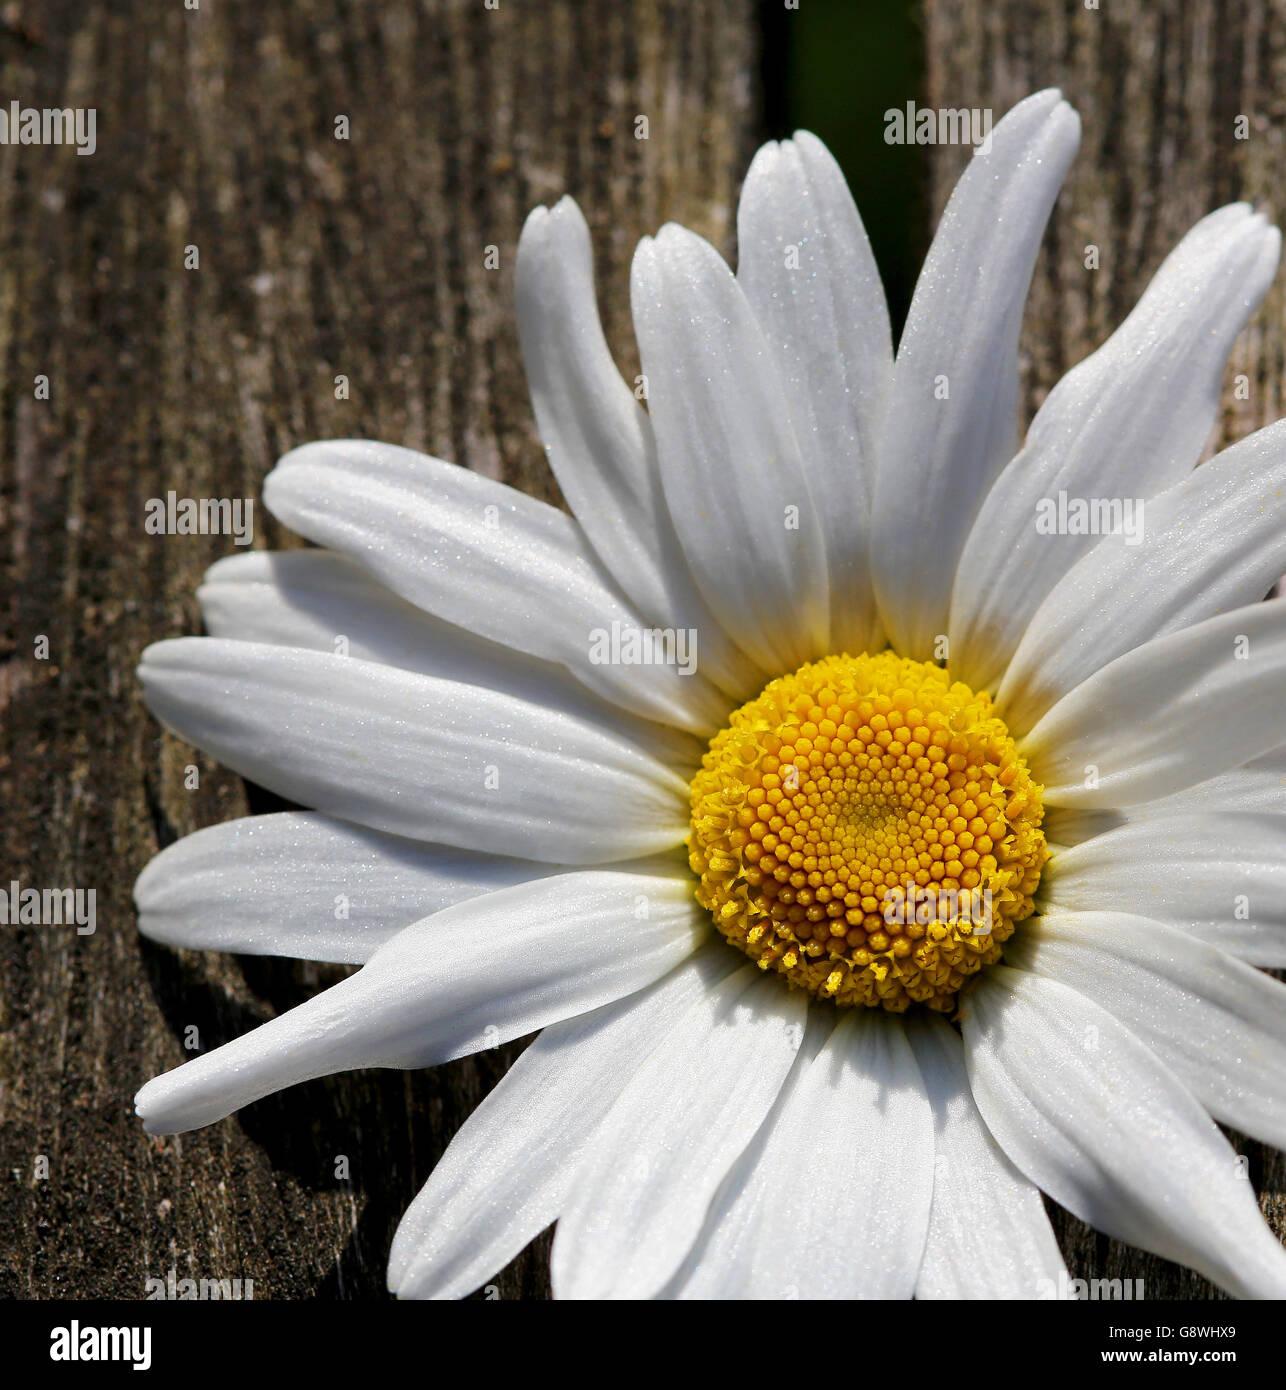 Large White Daisy Flowers Stock Photos Large White Daisy Flowers